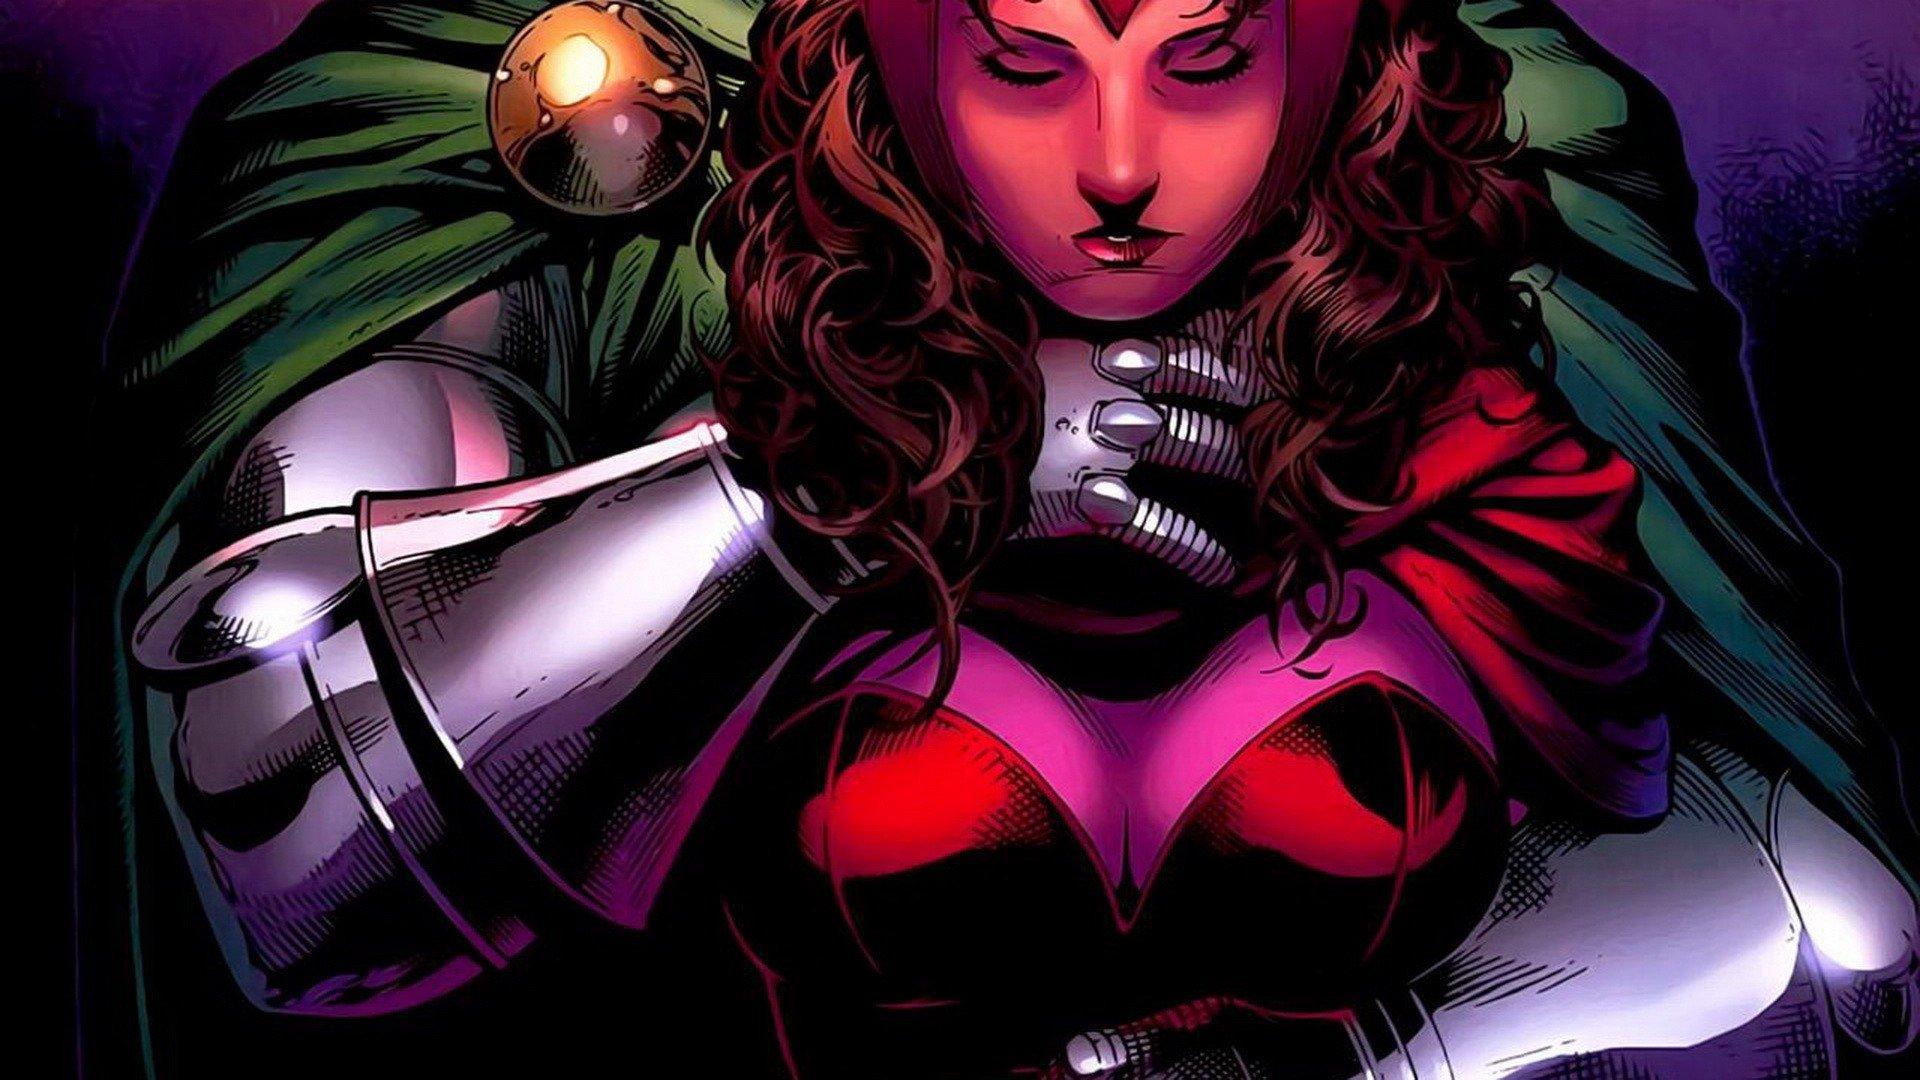 Comics Marvel Scarlet Witch Girls Dr Doom Avengers Wallpaper